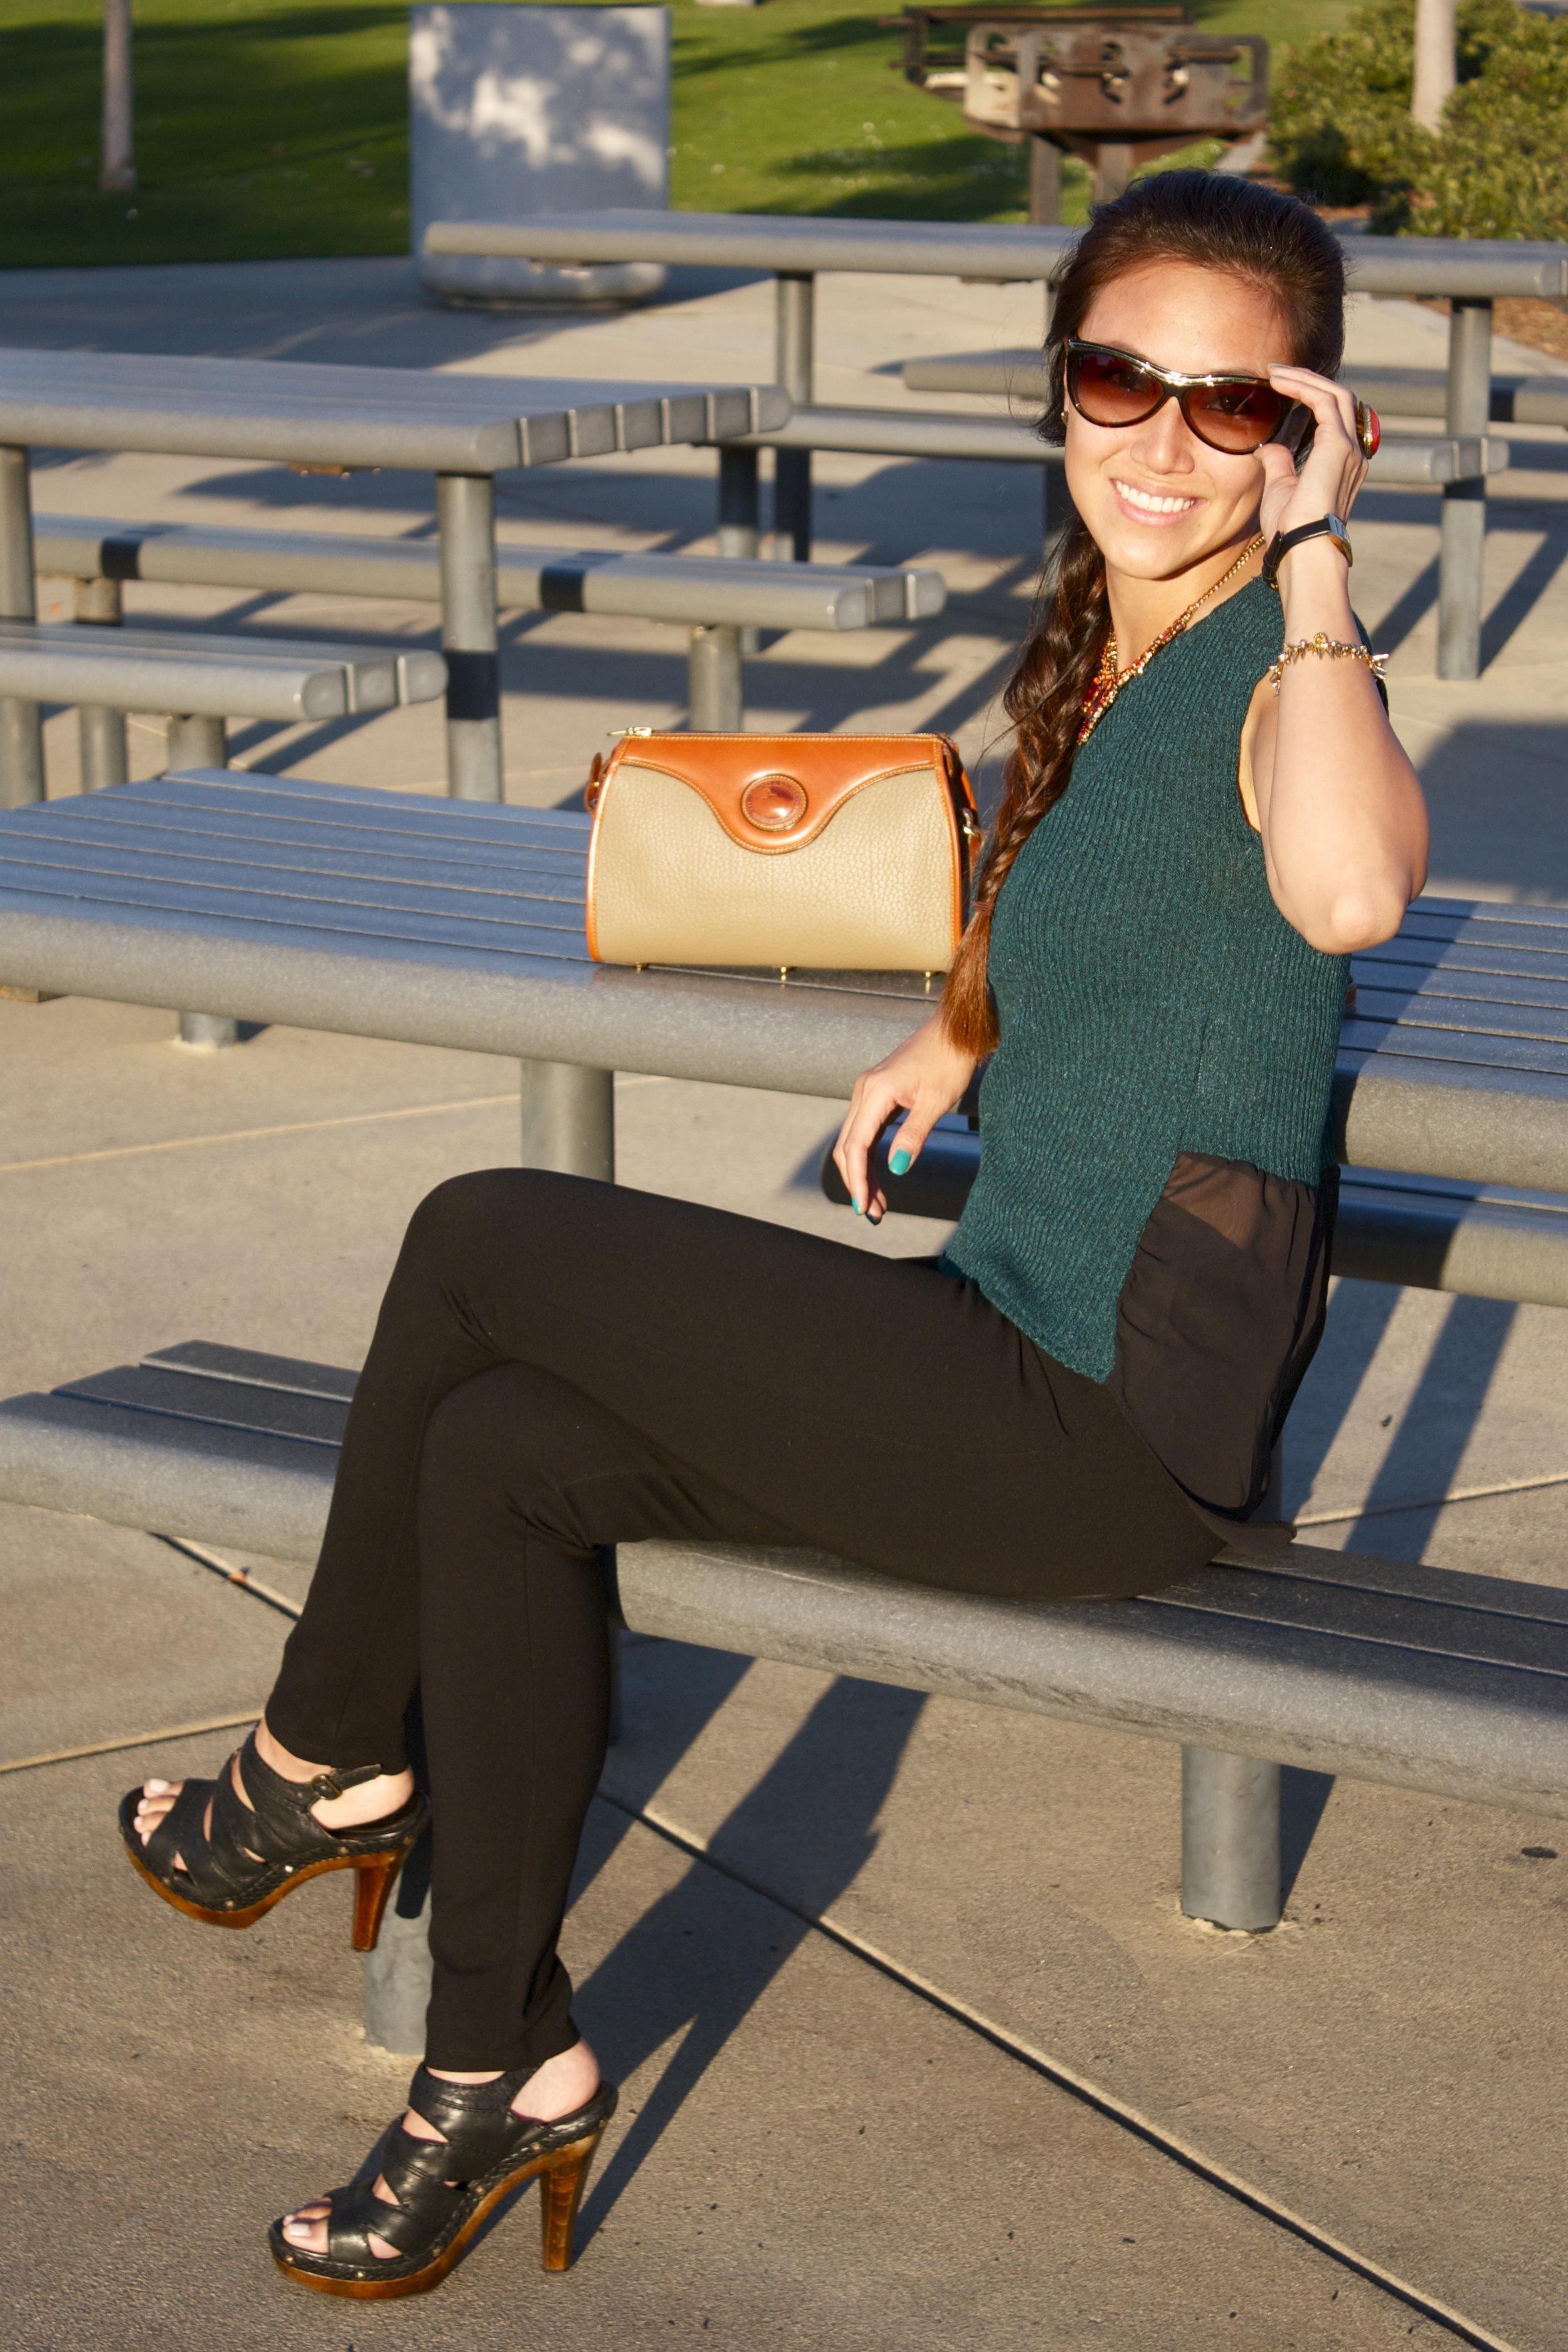 Picnic bench sunglasses shot